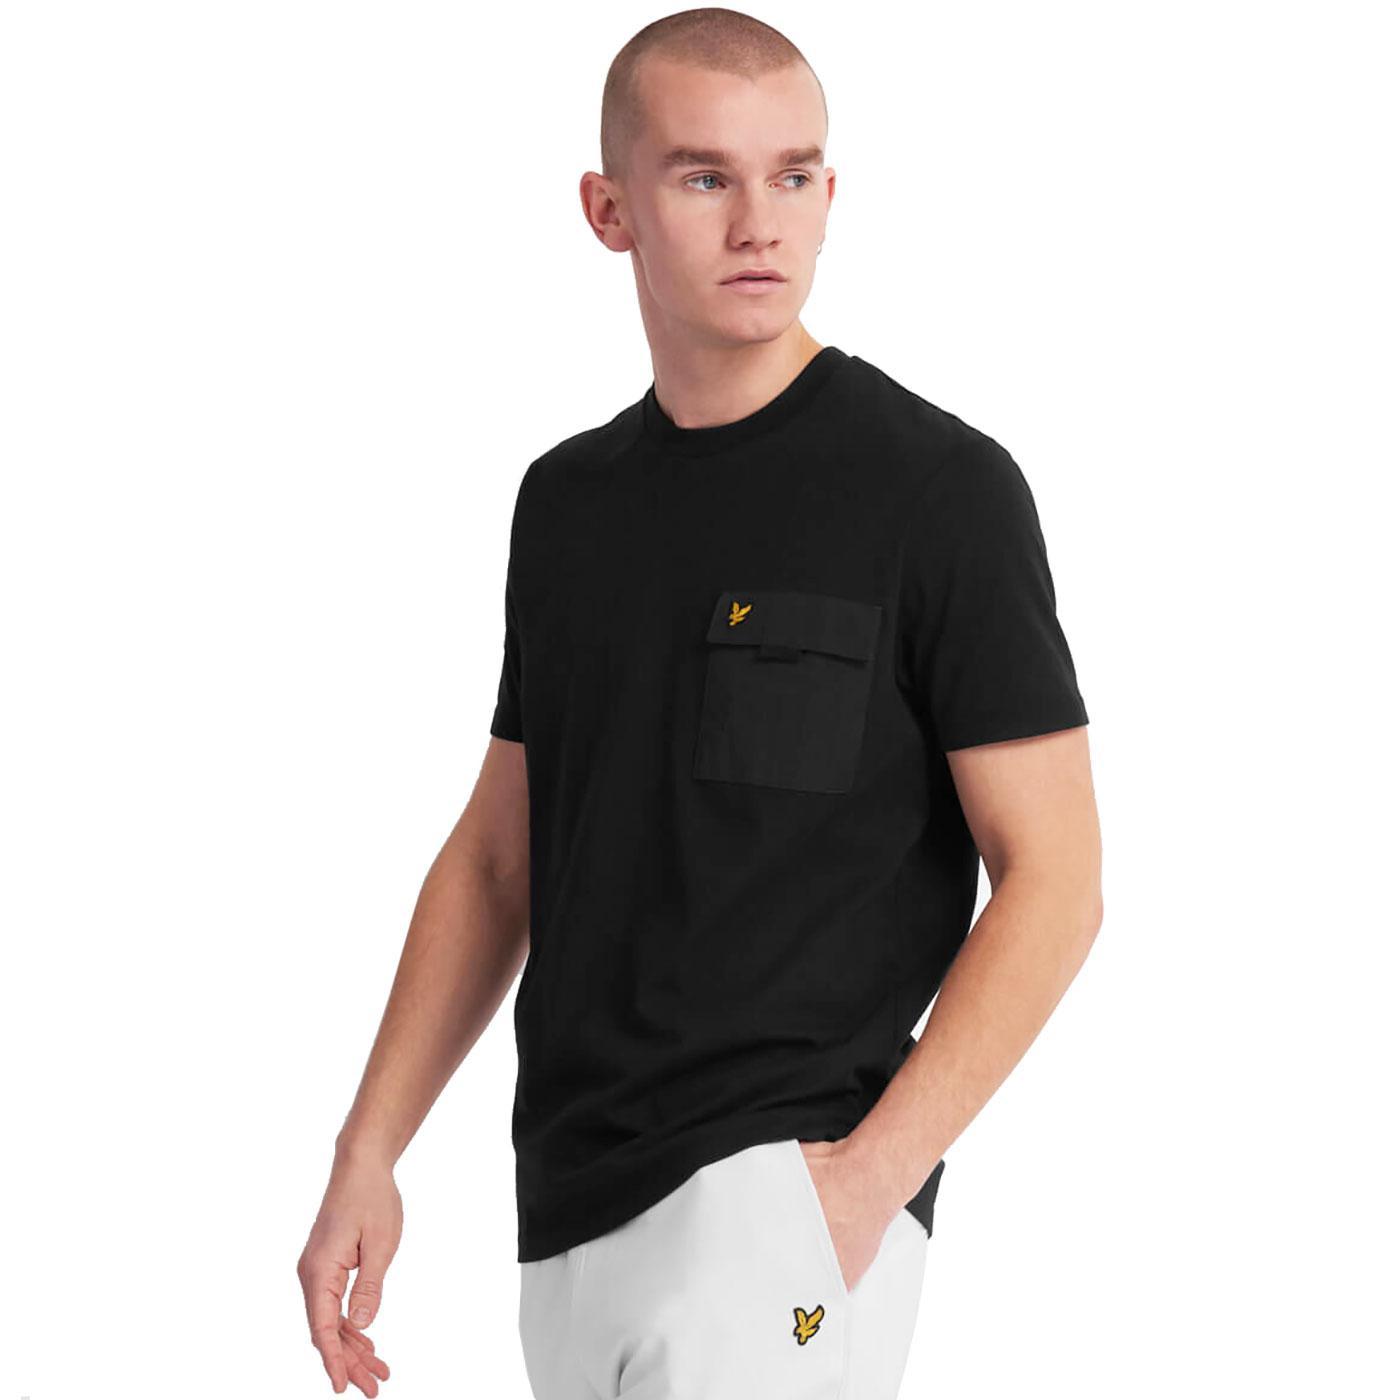 LYLE & SCOTT Men's Retro Chest Pocket T-Shirt